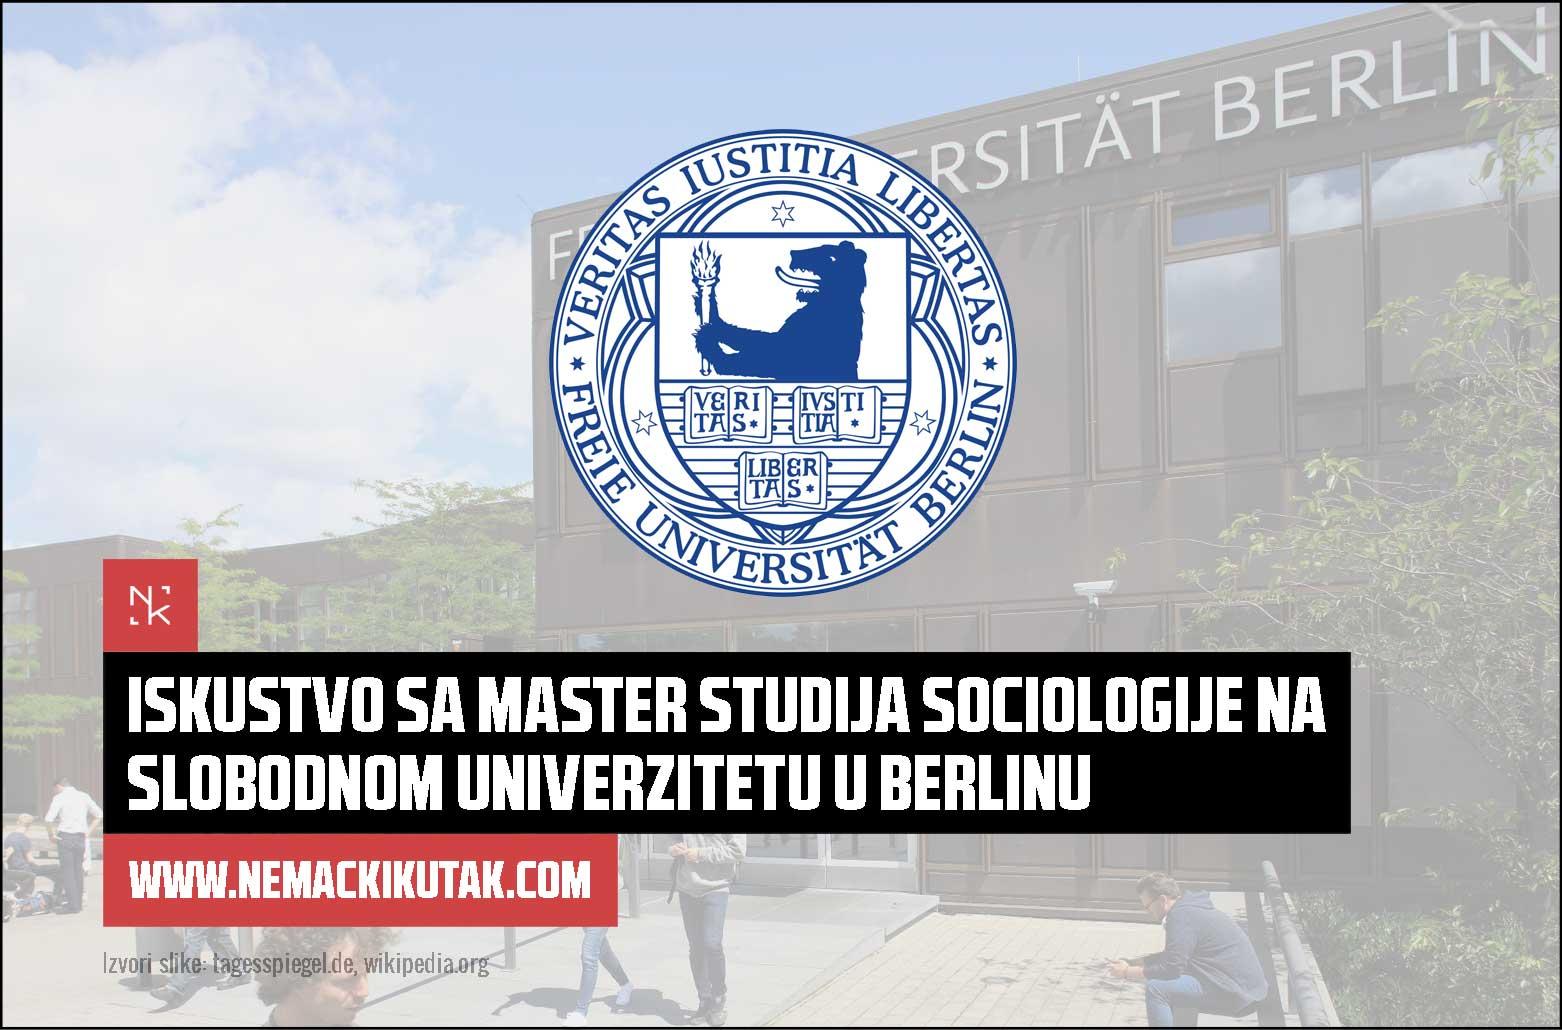 master-sociologija-freie-uni-berlin-germany